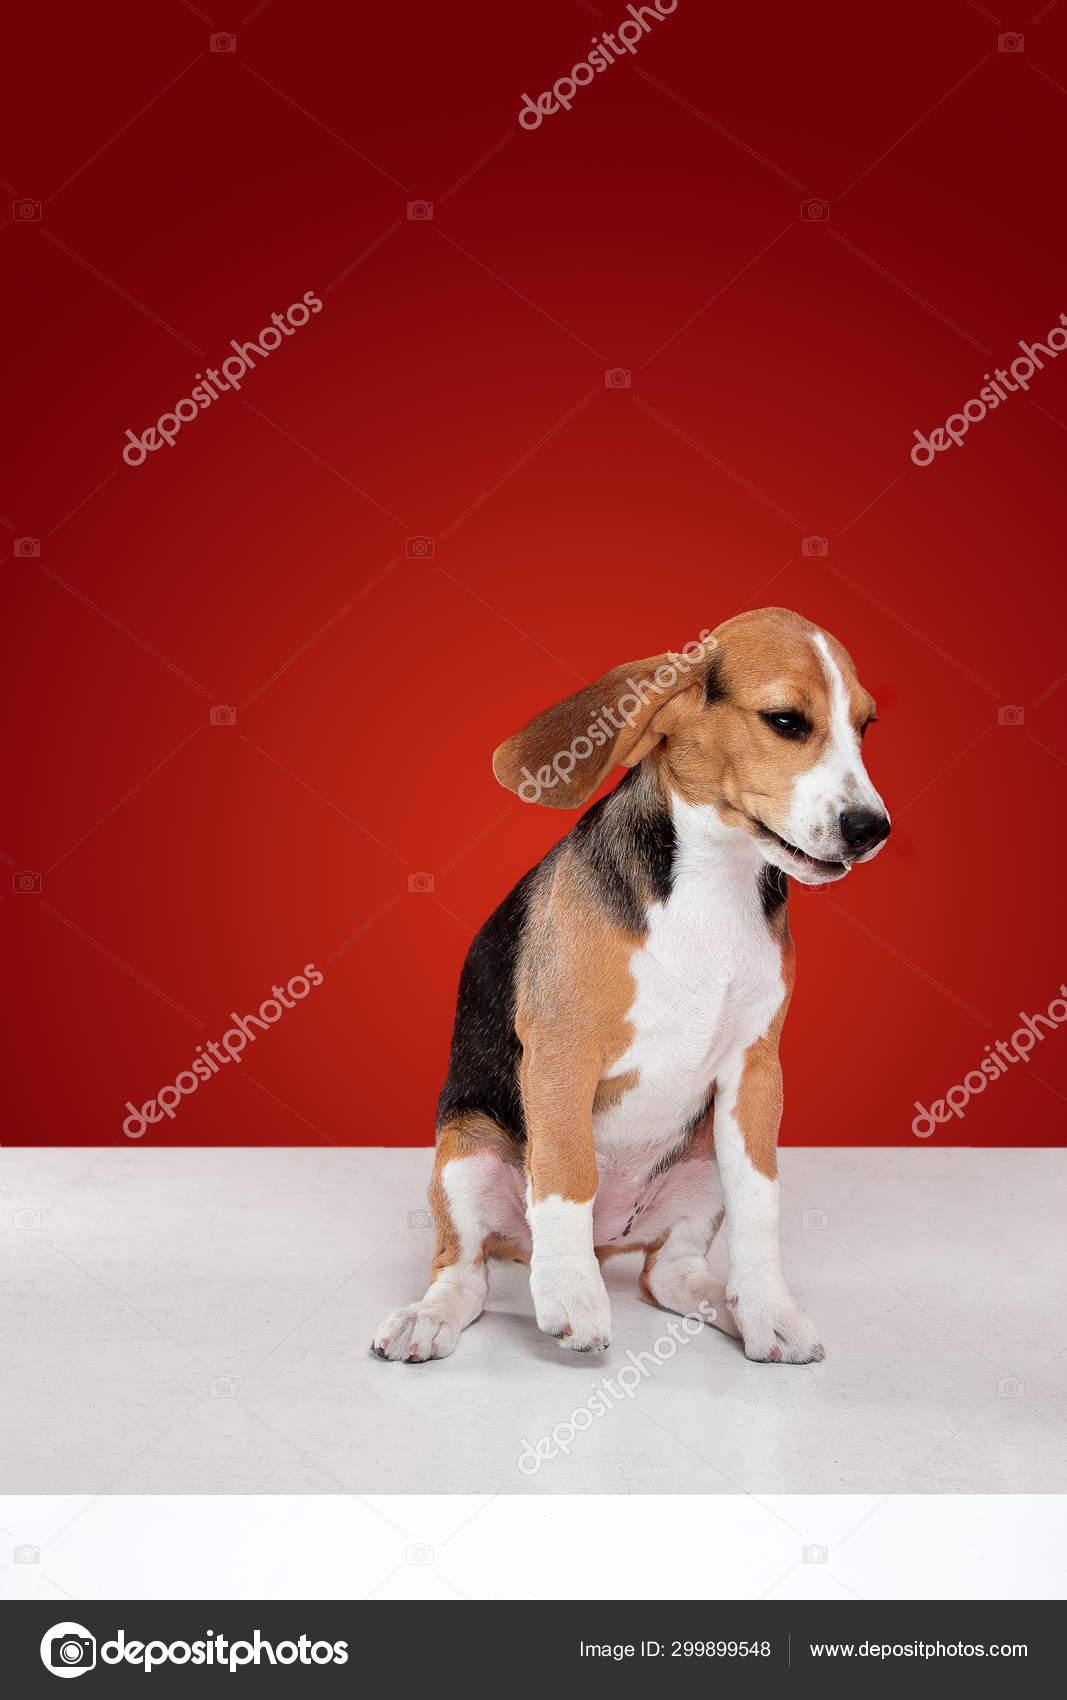 Studio Shot Of Beagle Puppy On Red Studio Background Stock Photo C Vova130555 Gmail Com 299899548